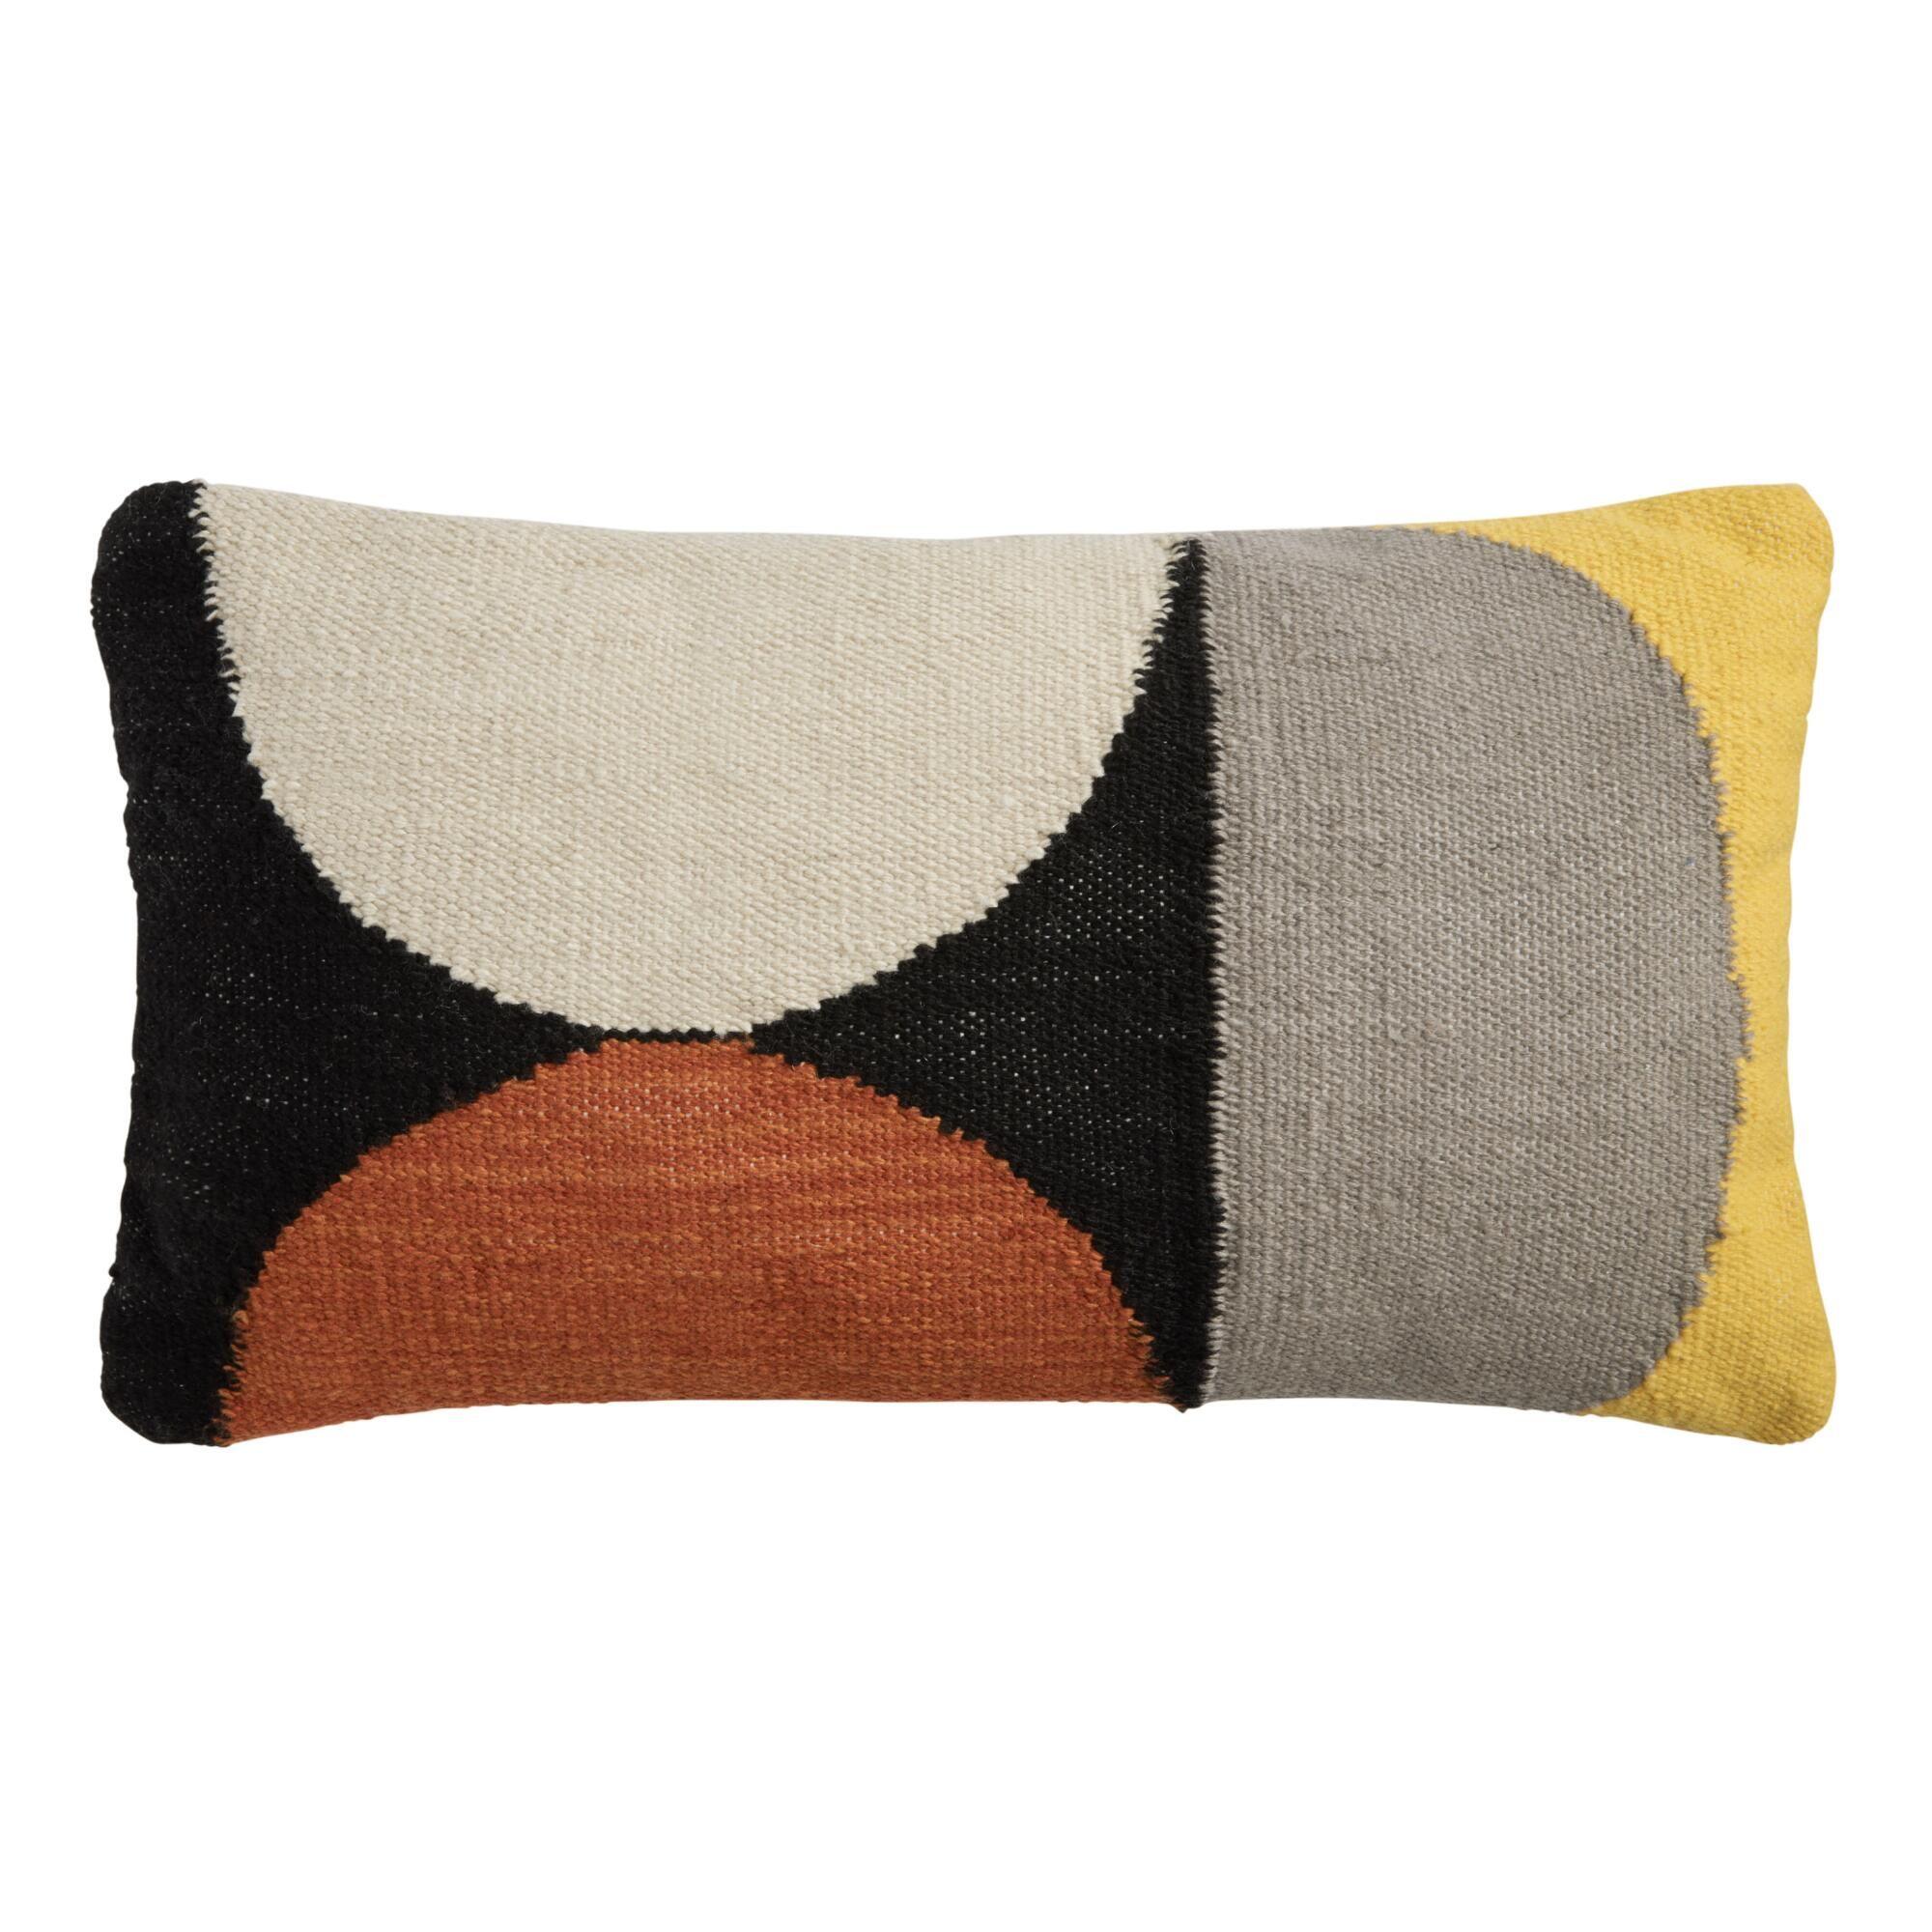 Woven Circles Indoor Outdoor Patio Lumbar Pillow By World Market Lumbar Pillow Mid Century Modern Pillows Outdoor Pillows